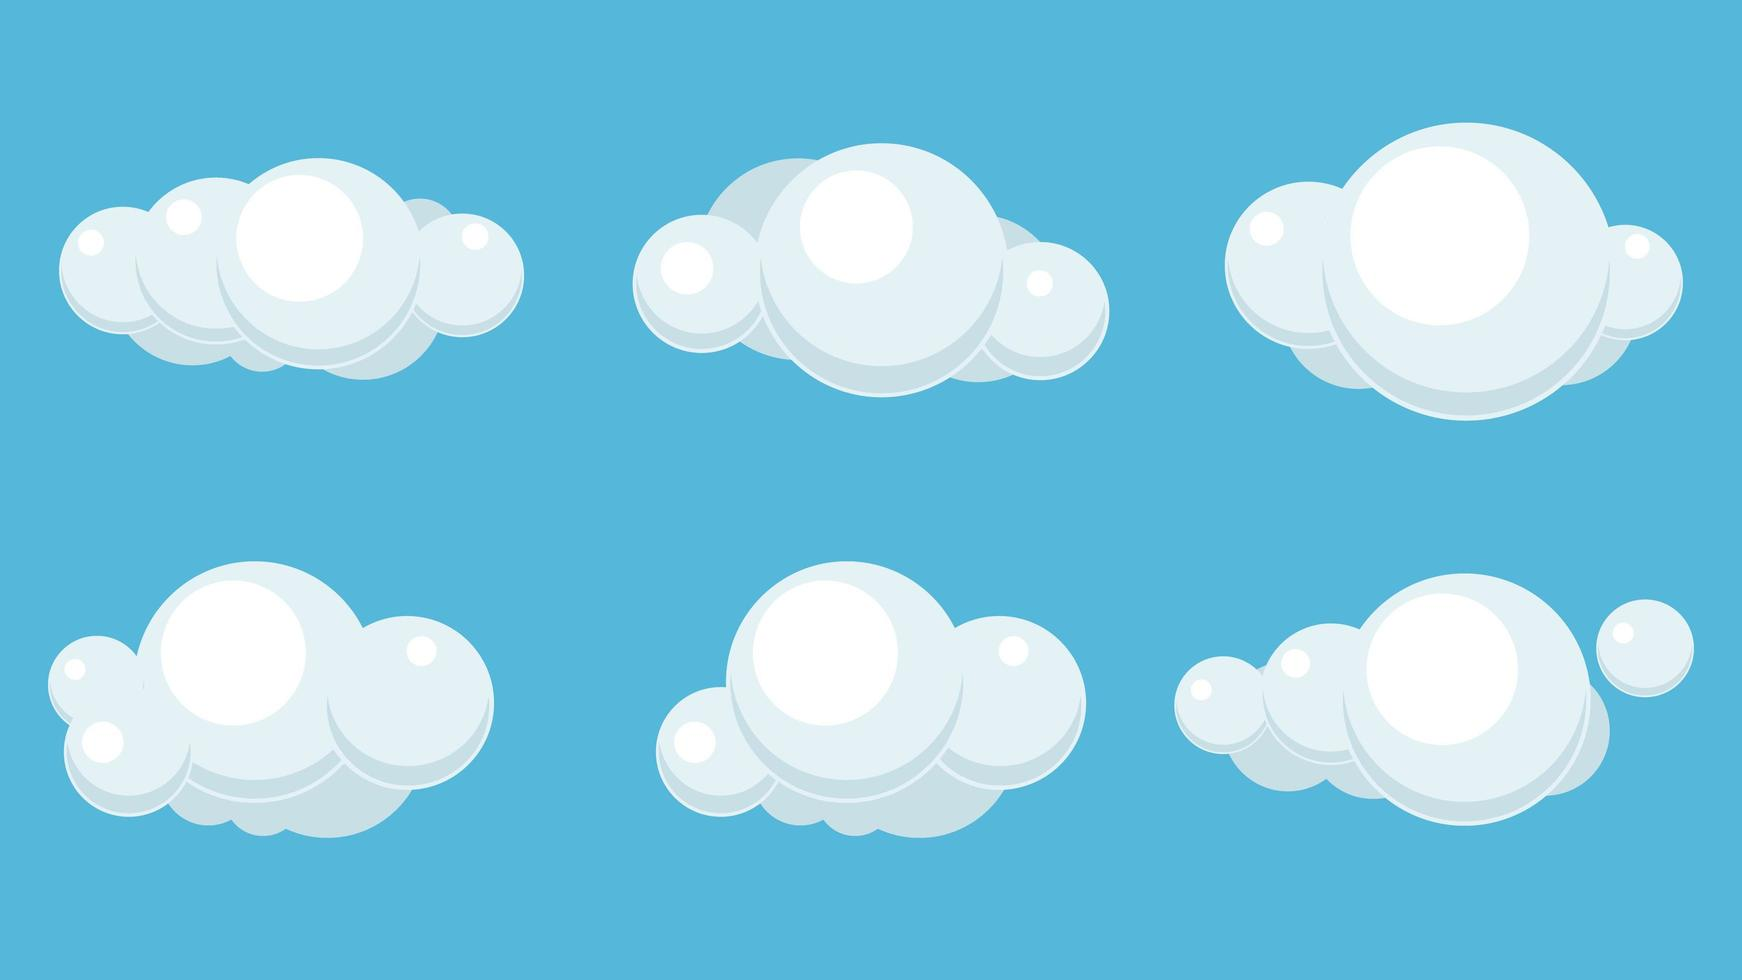 conjunto de nuvens brilhantes dos desenhos animados - Download de Vetor